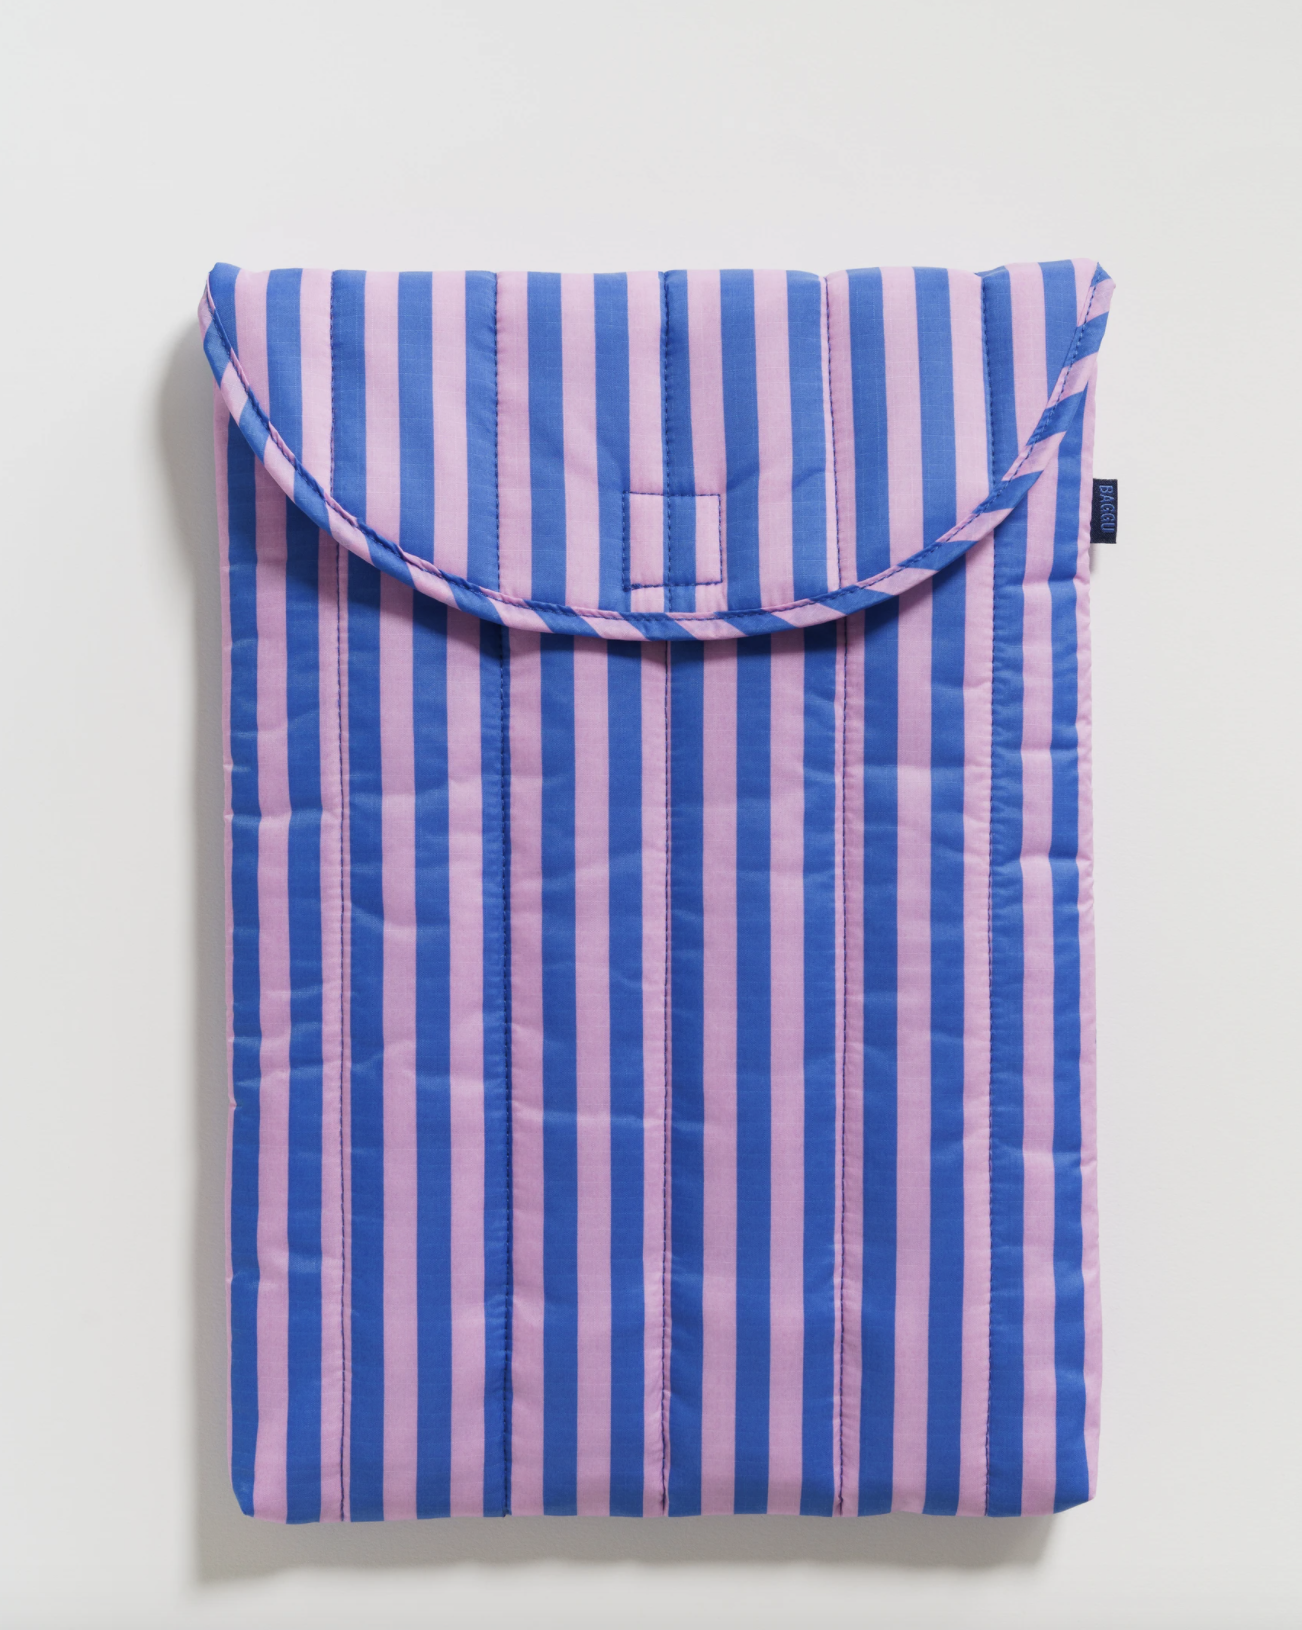 "BAGGU - Puffy Laptop Sleeve 16"", Pink and blue stripe"